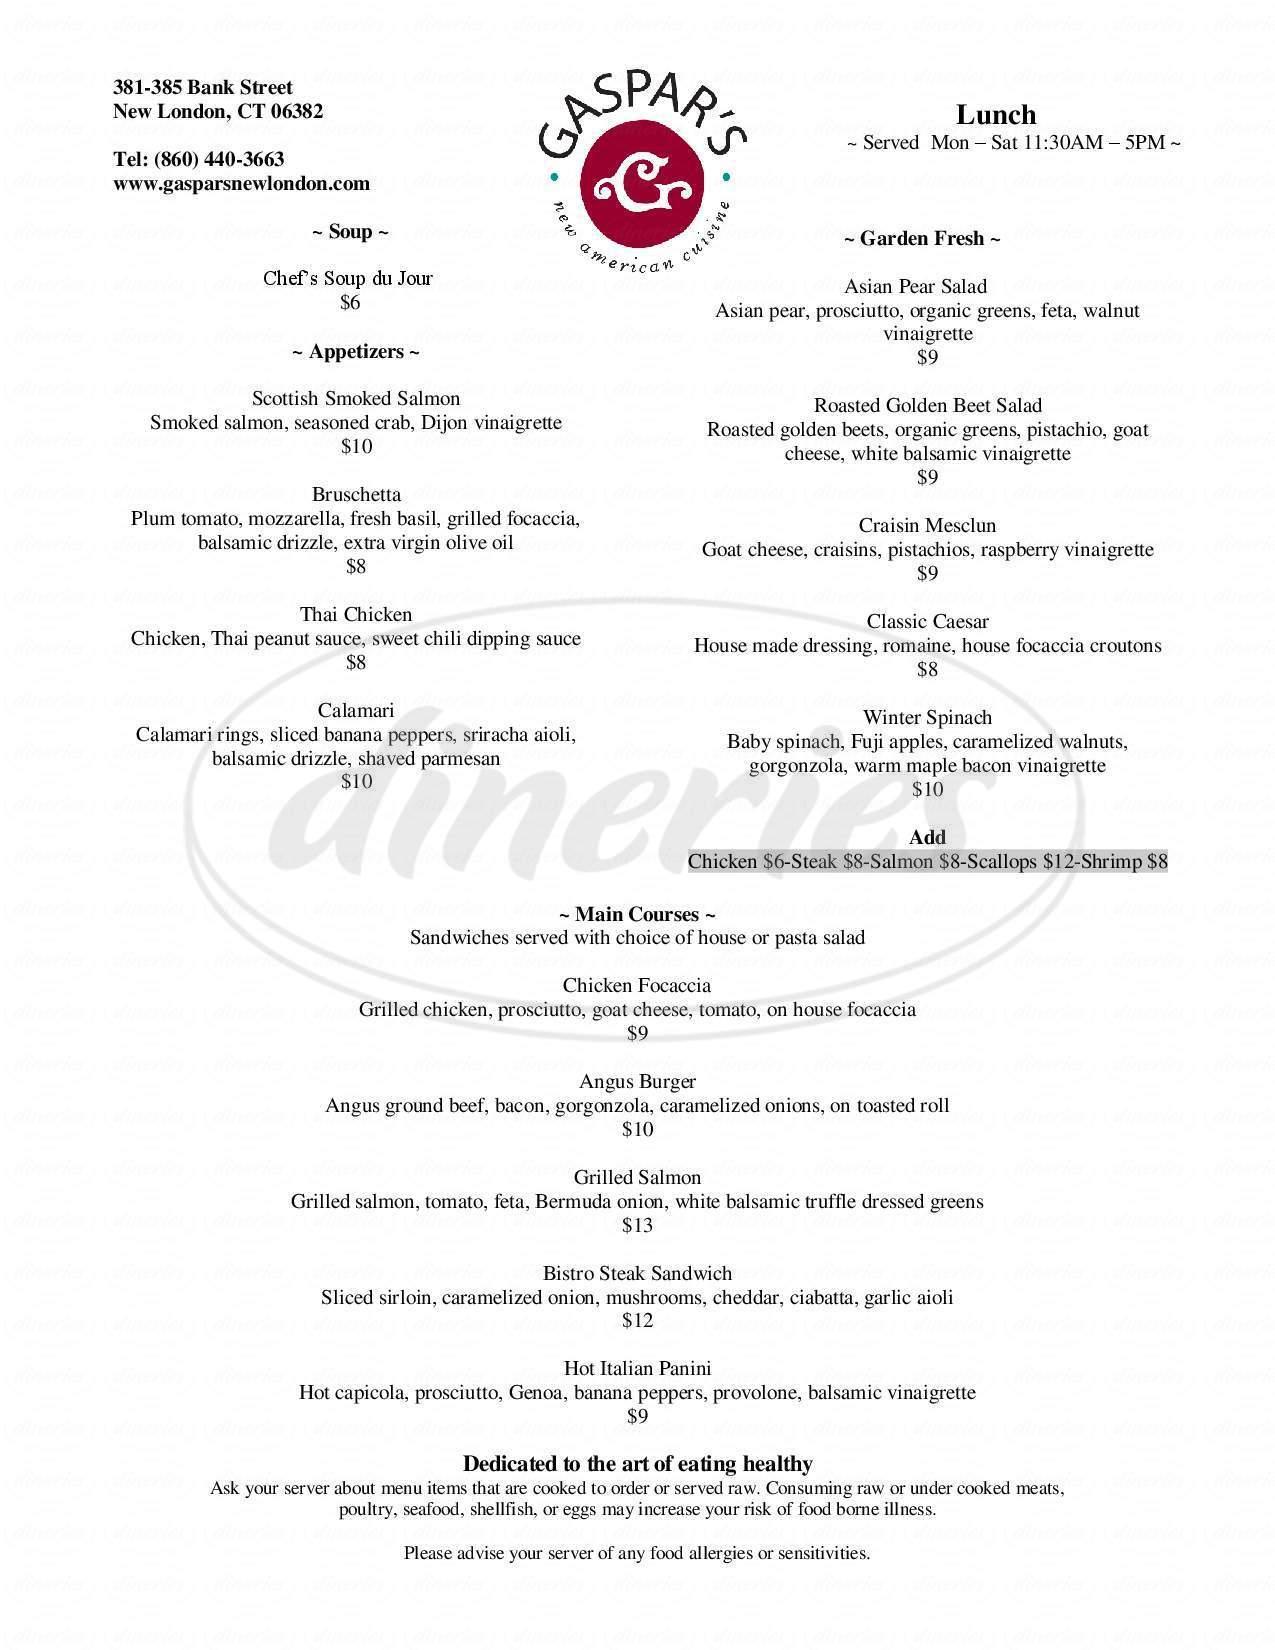 menu for Gaspars